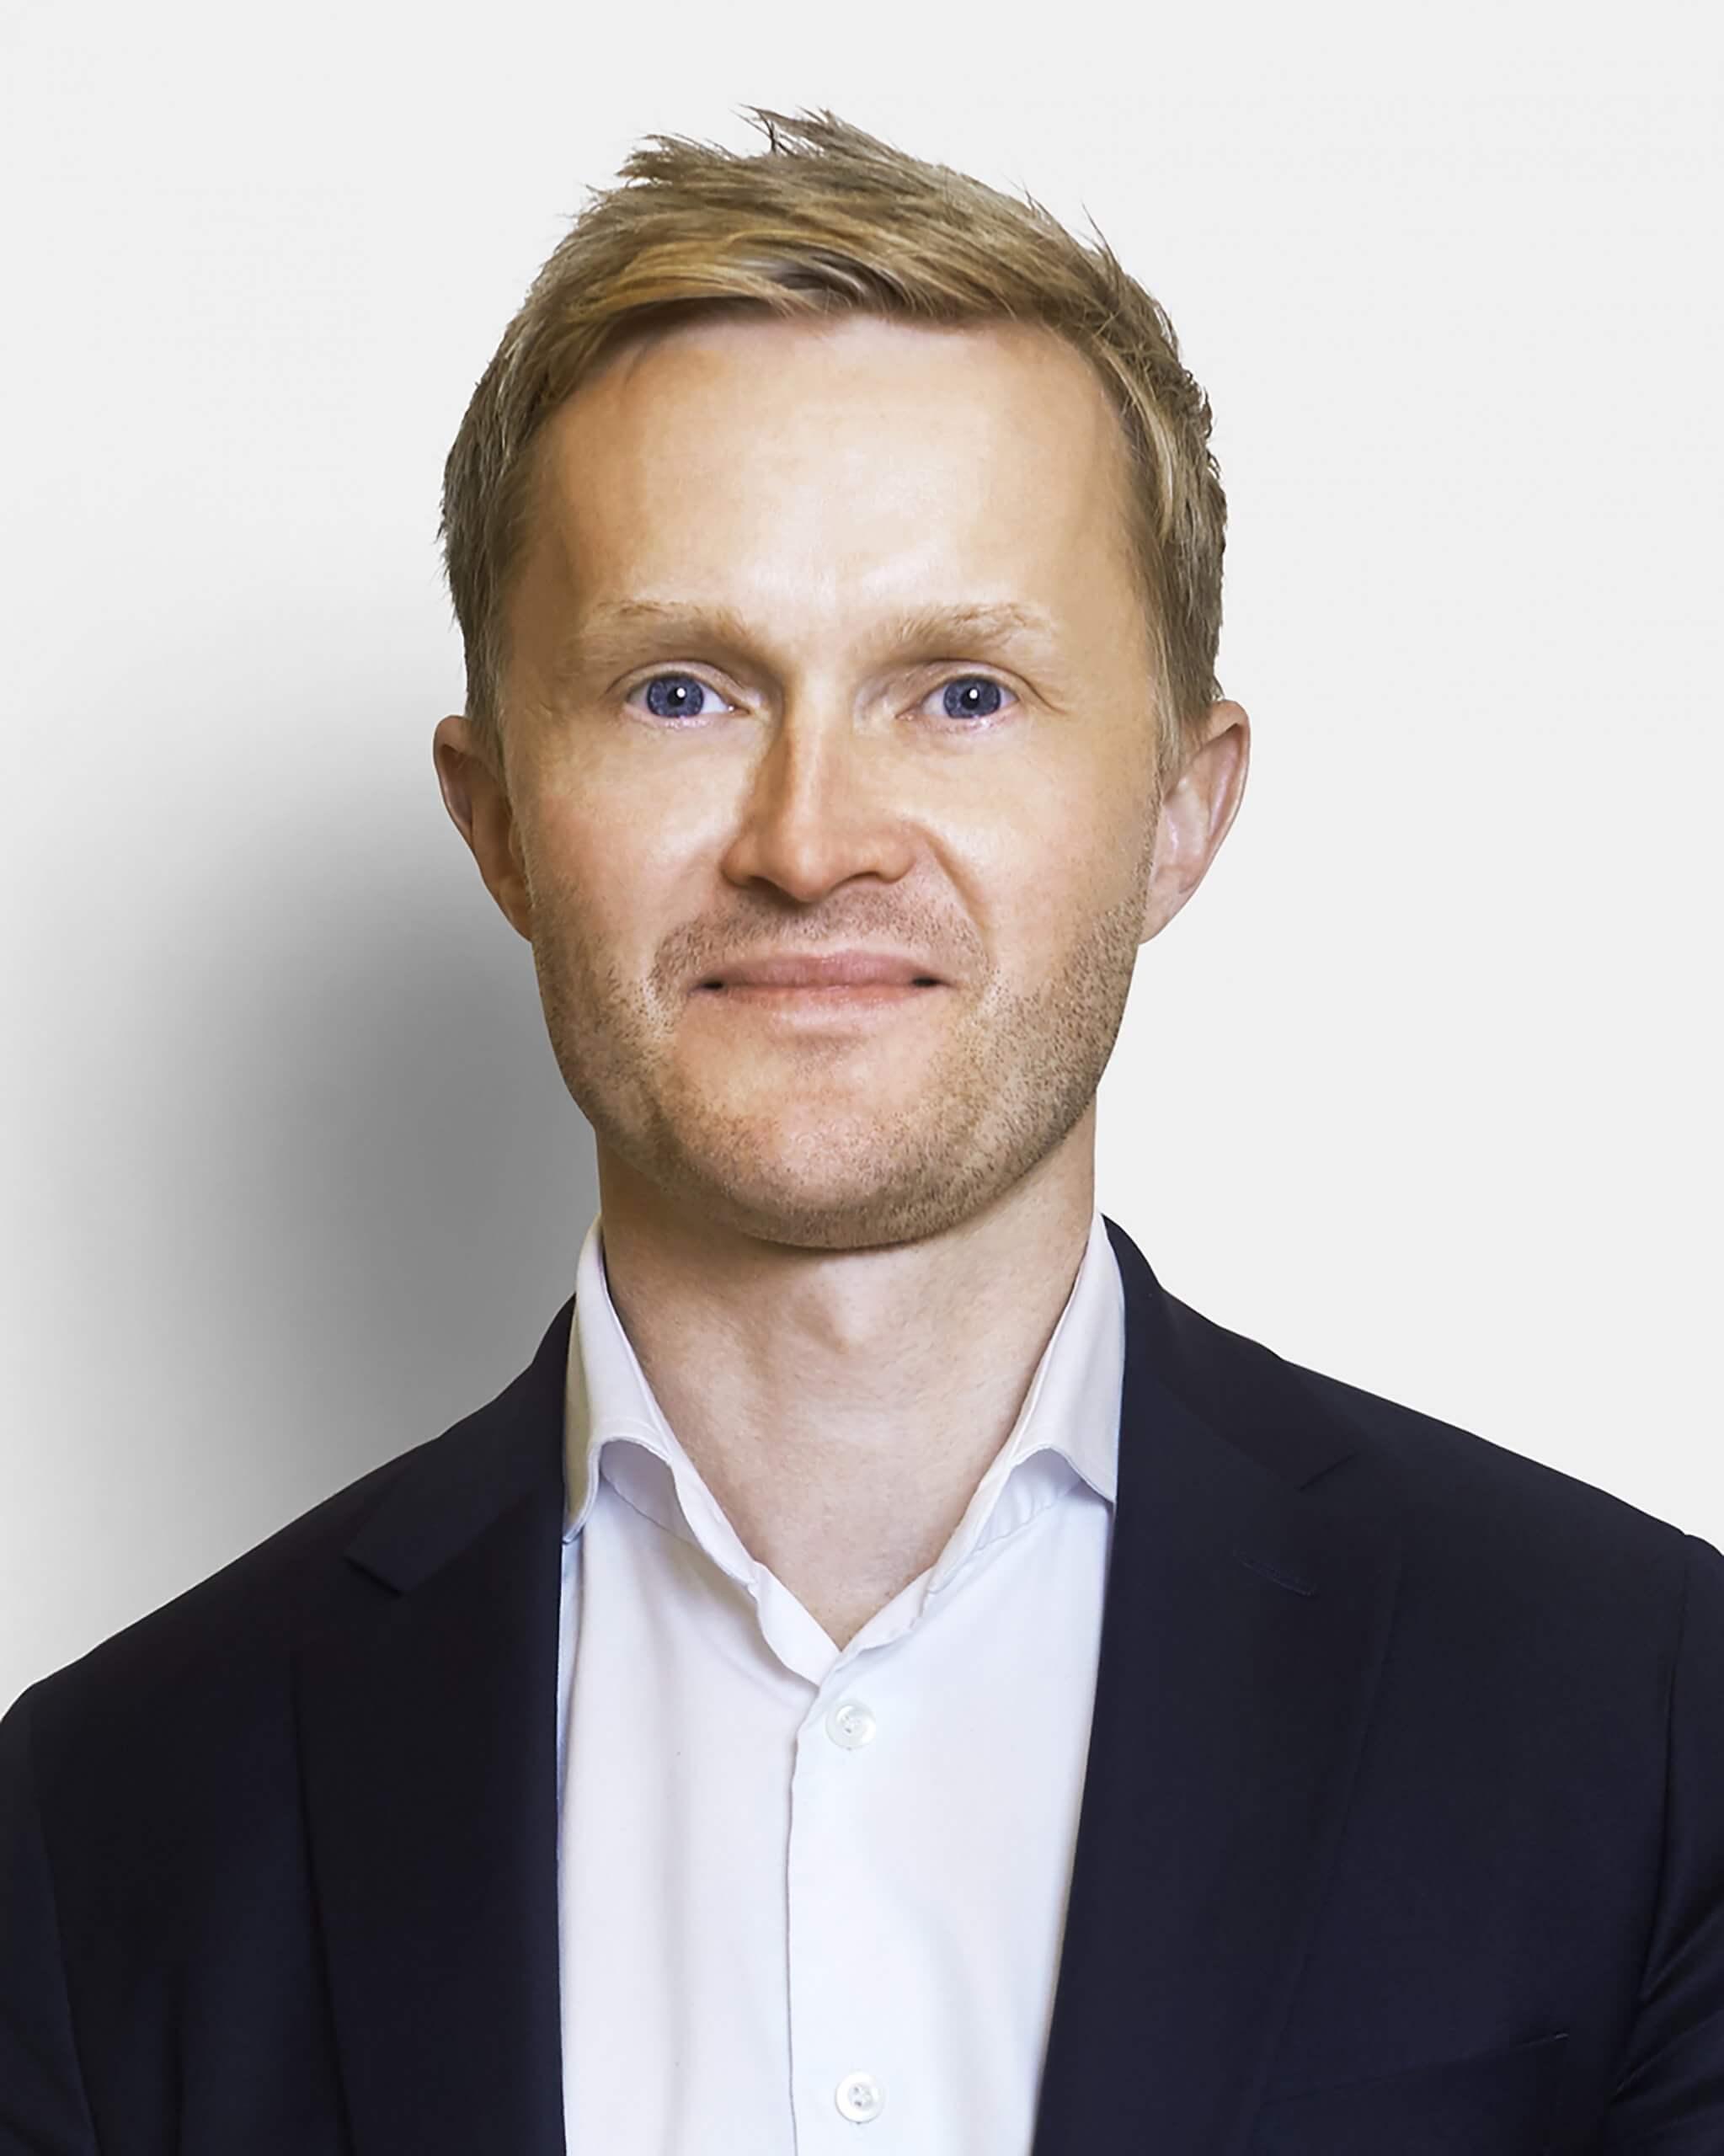 Martin V. Dalsager